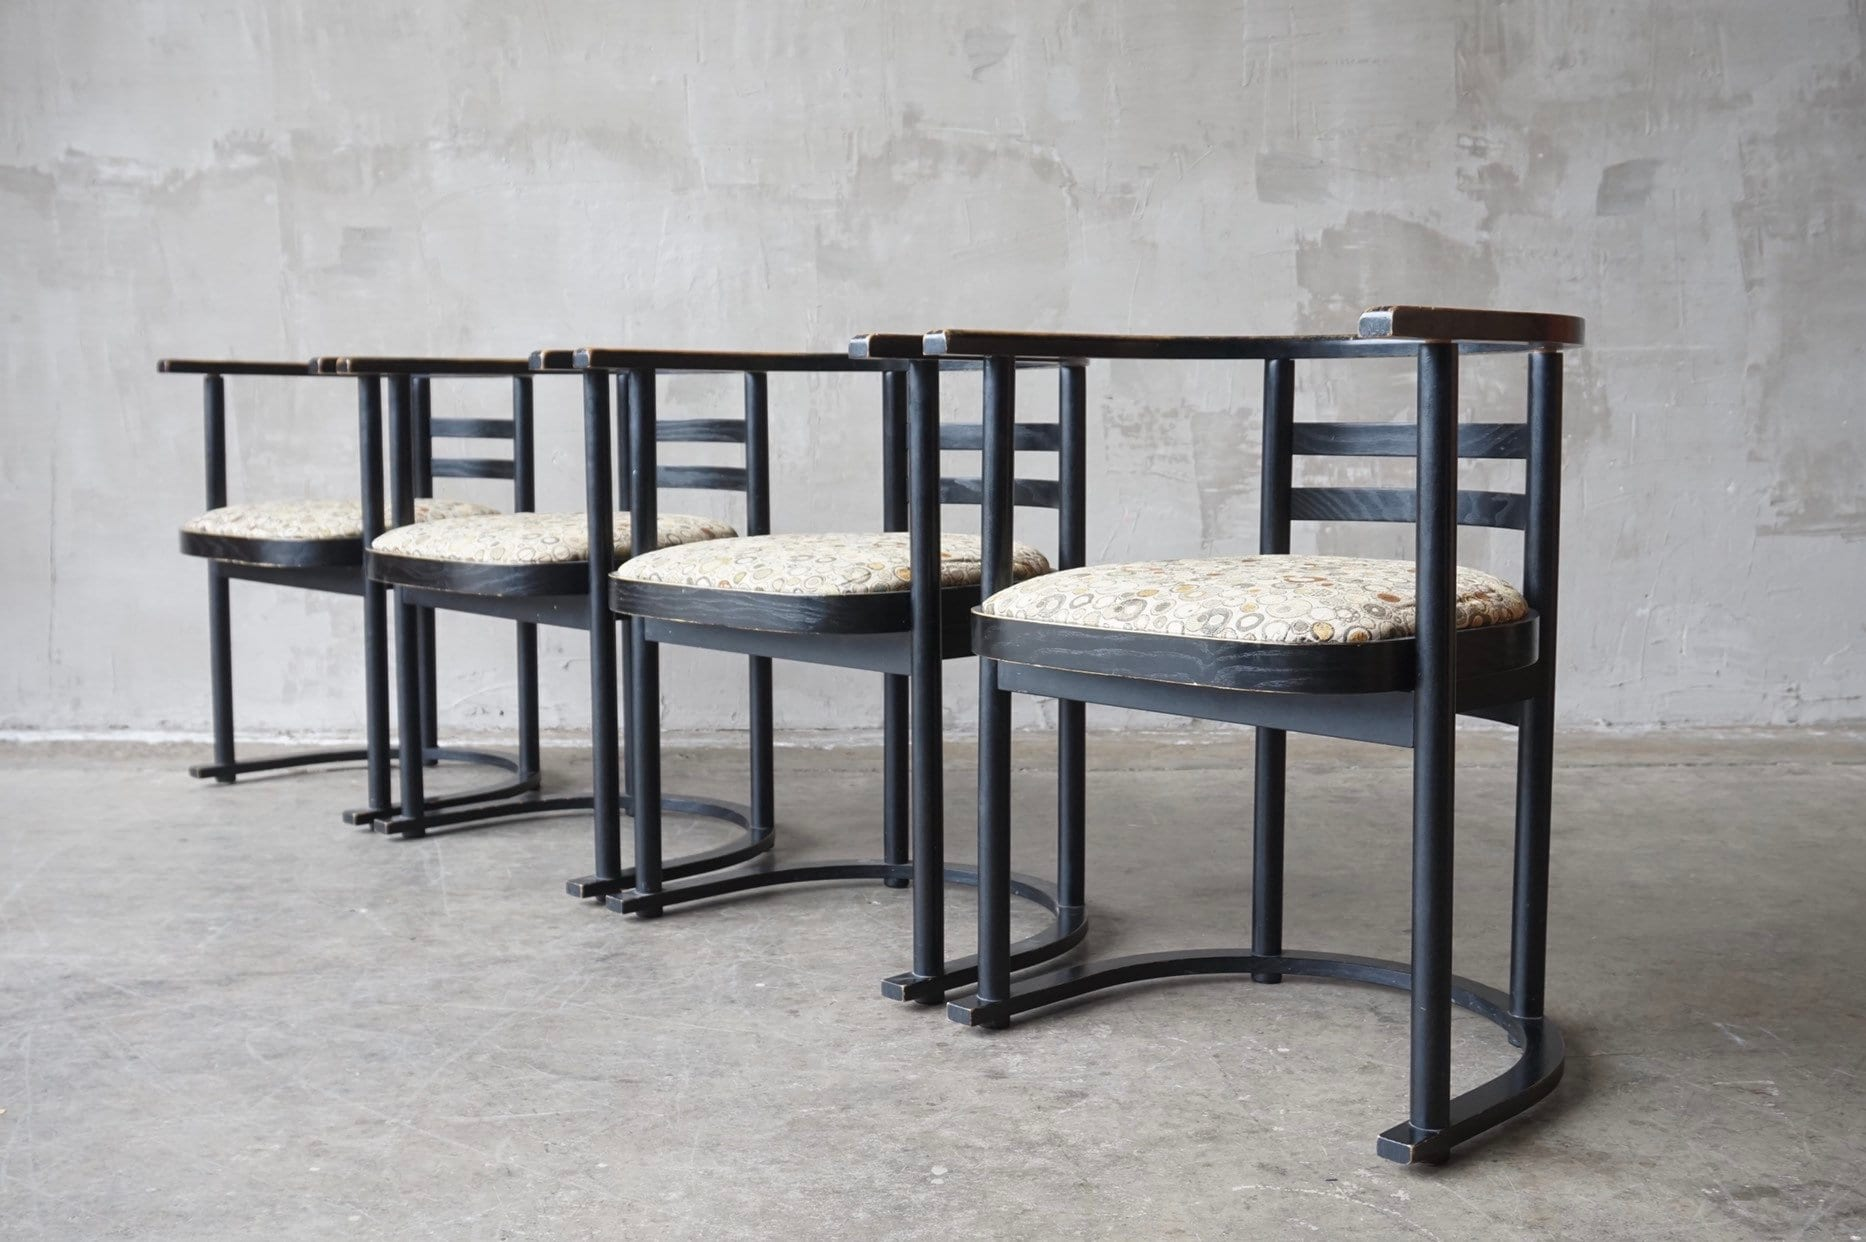 Awe Inspiring Josef Hoffmann Fledermaus Style Chairs Download Free Architecture Designs Rallybritishbridgeorg